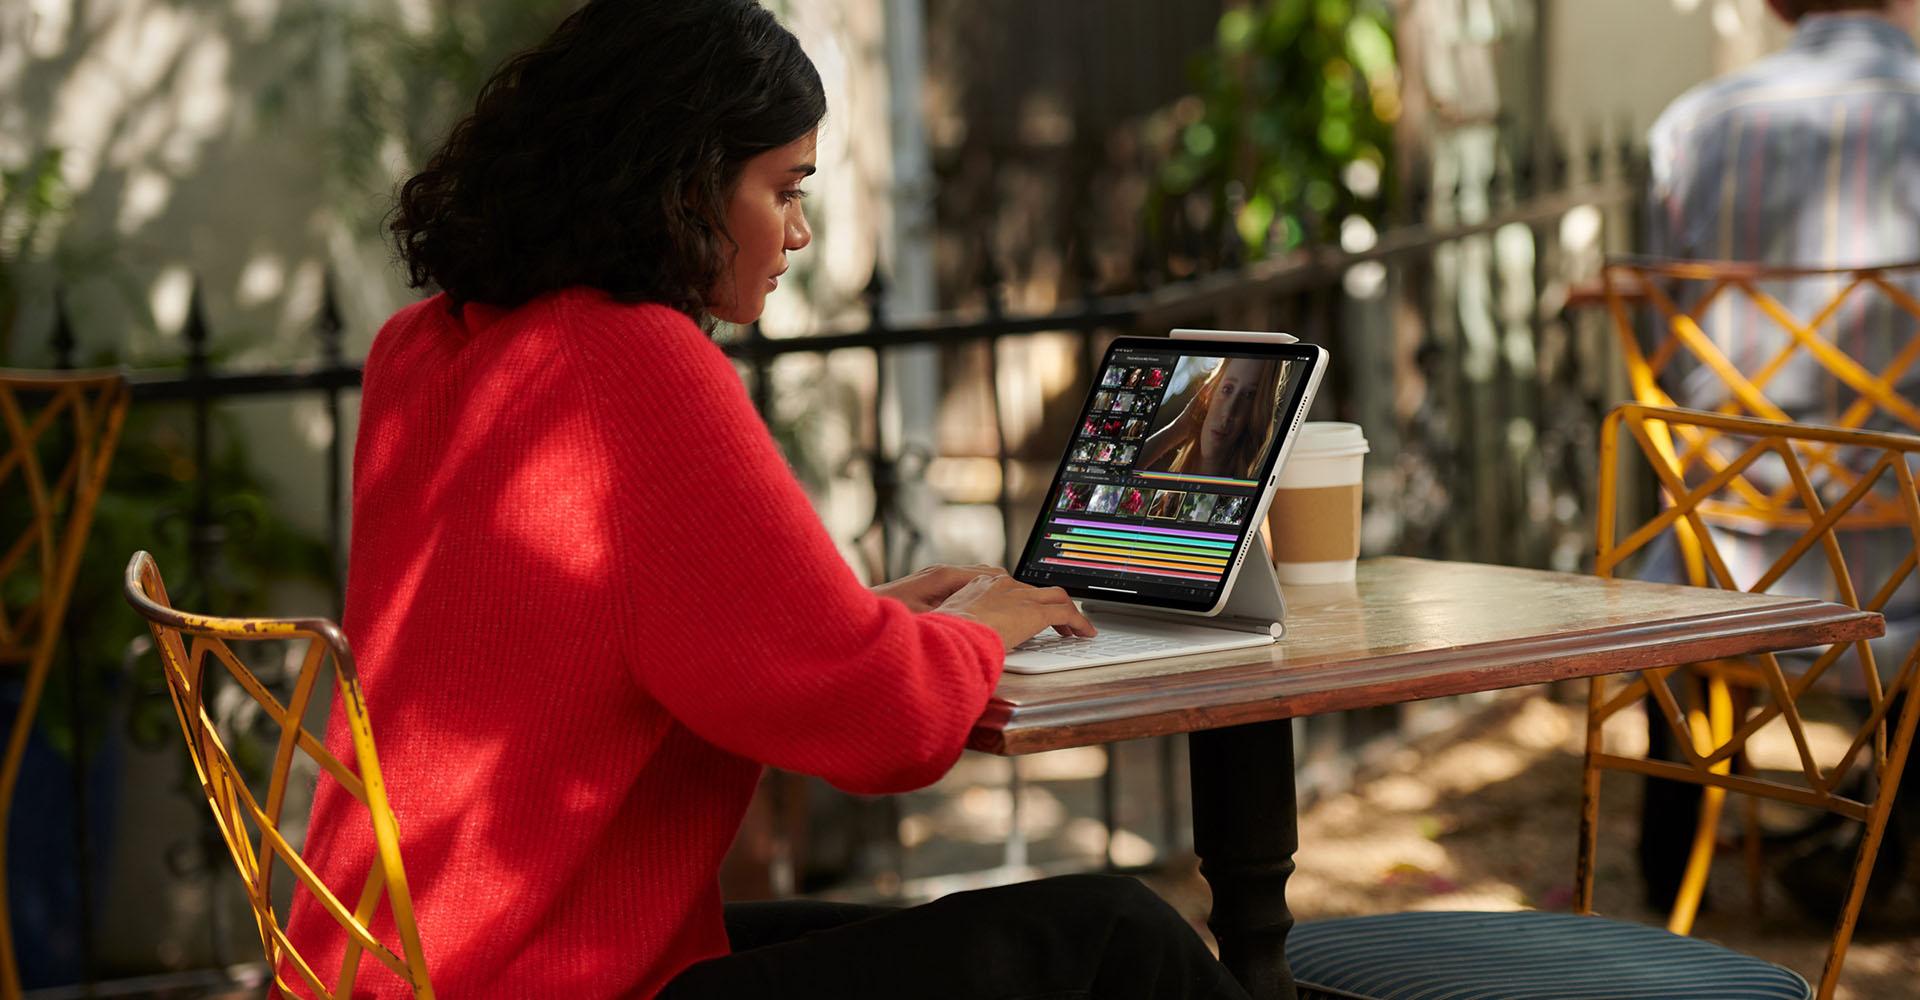 Frau arbeitet im Café mit dem iPad Pro 2021